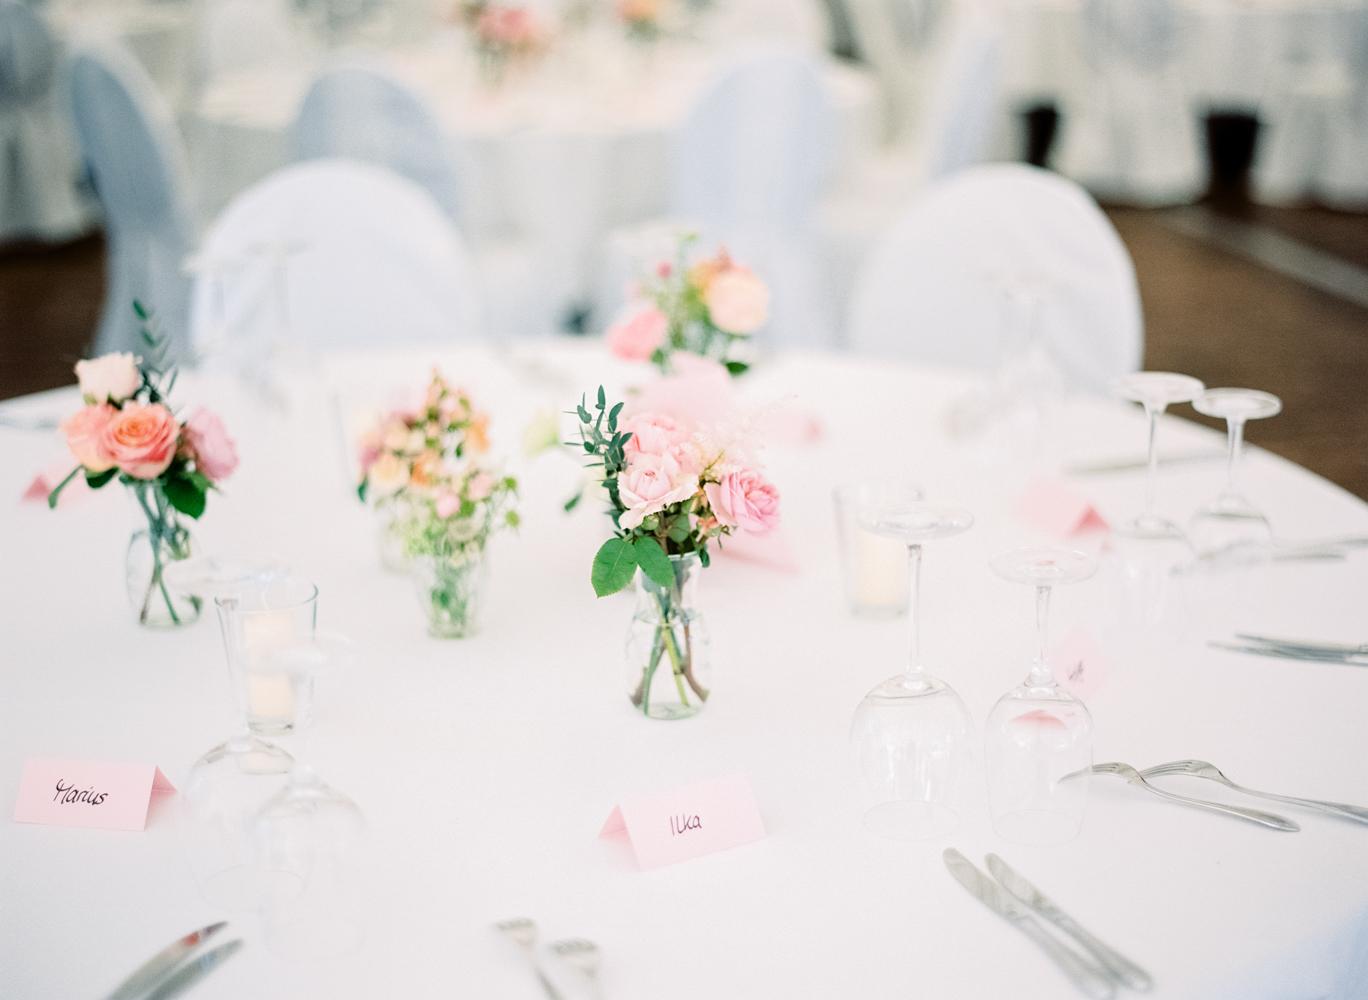 Hochzeitsfotograf_Stuttgart_Karoline_Kirchhof (8).jpg